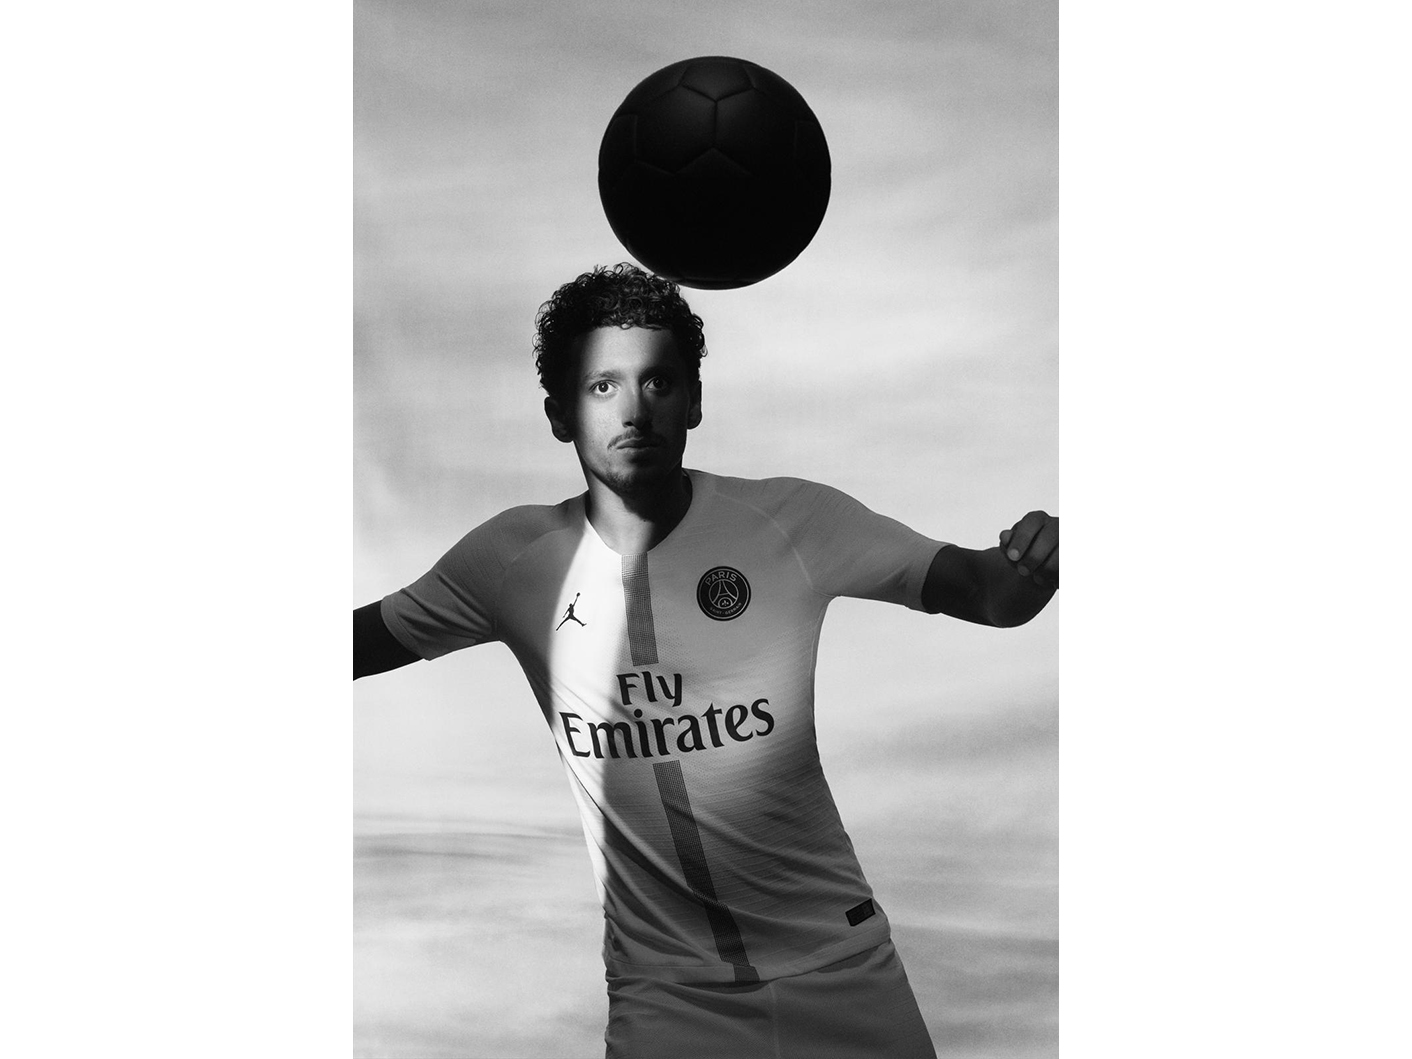 Jordan_Brand__Paris_Saint-Germain_as_its_First-Ever_Football_Club_Soccer_39_81748